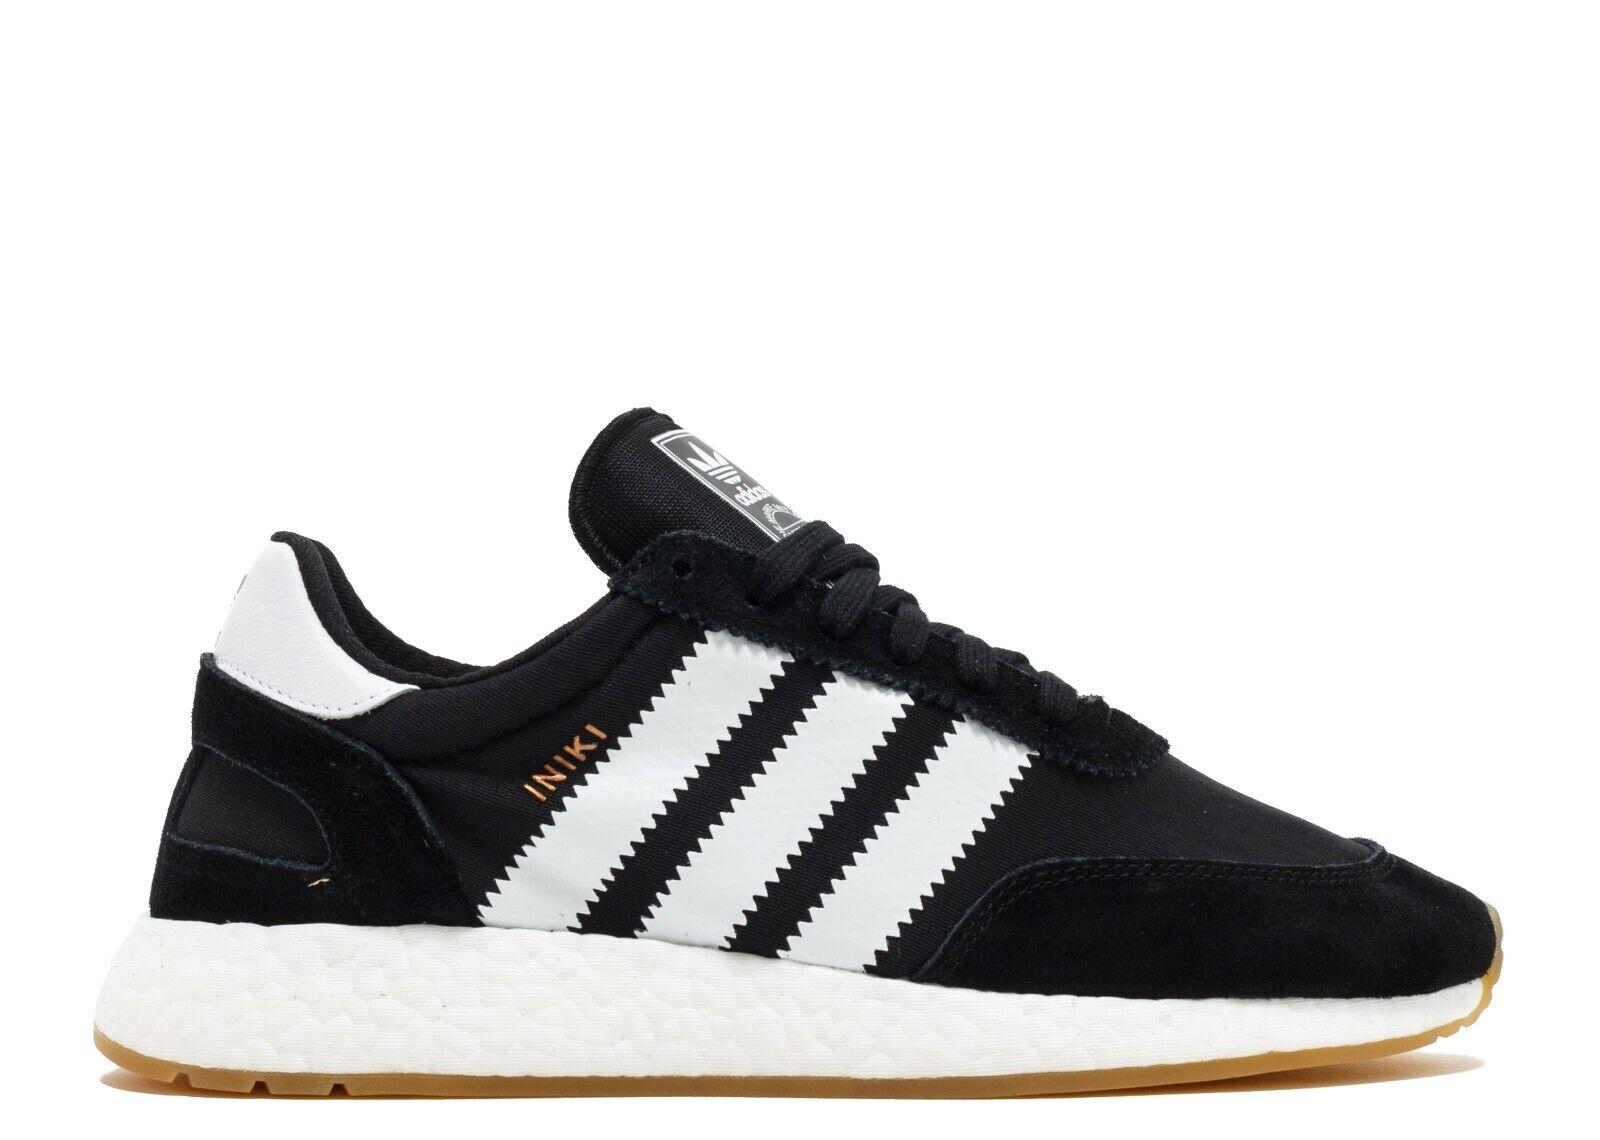 Adidas I - 5923 zapatos negros   blancoos - by9727